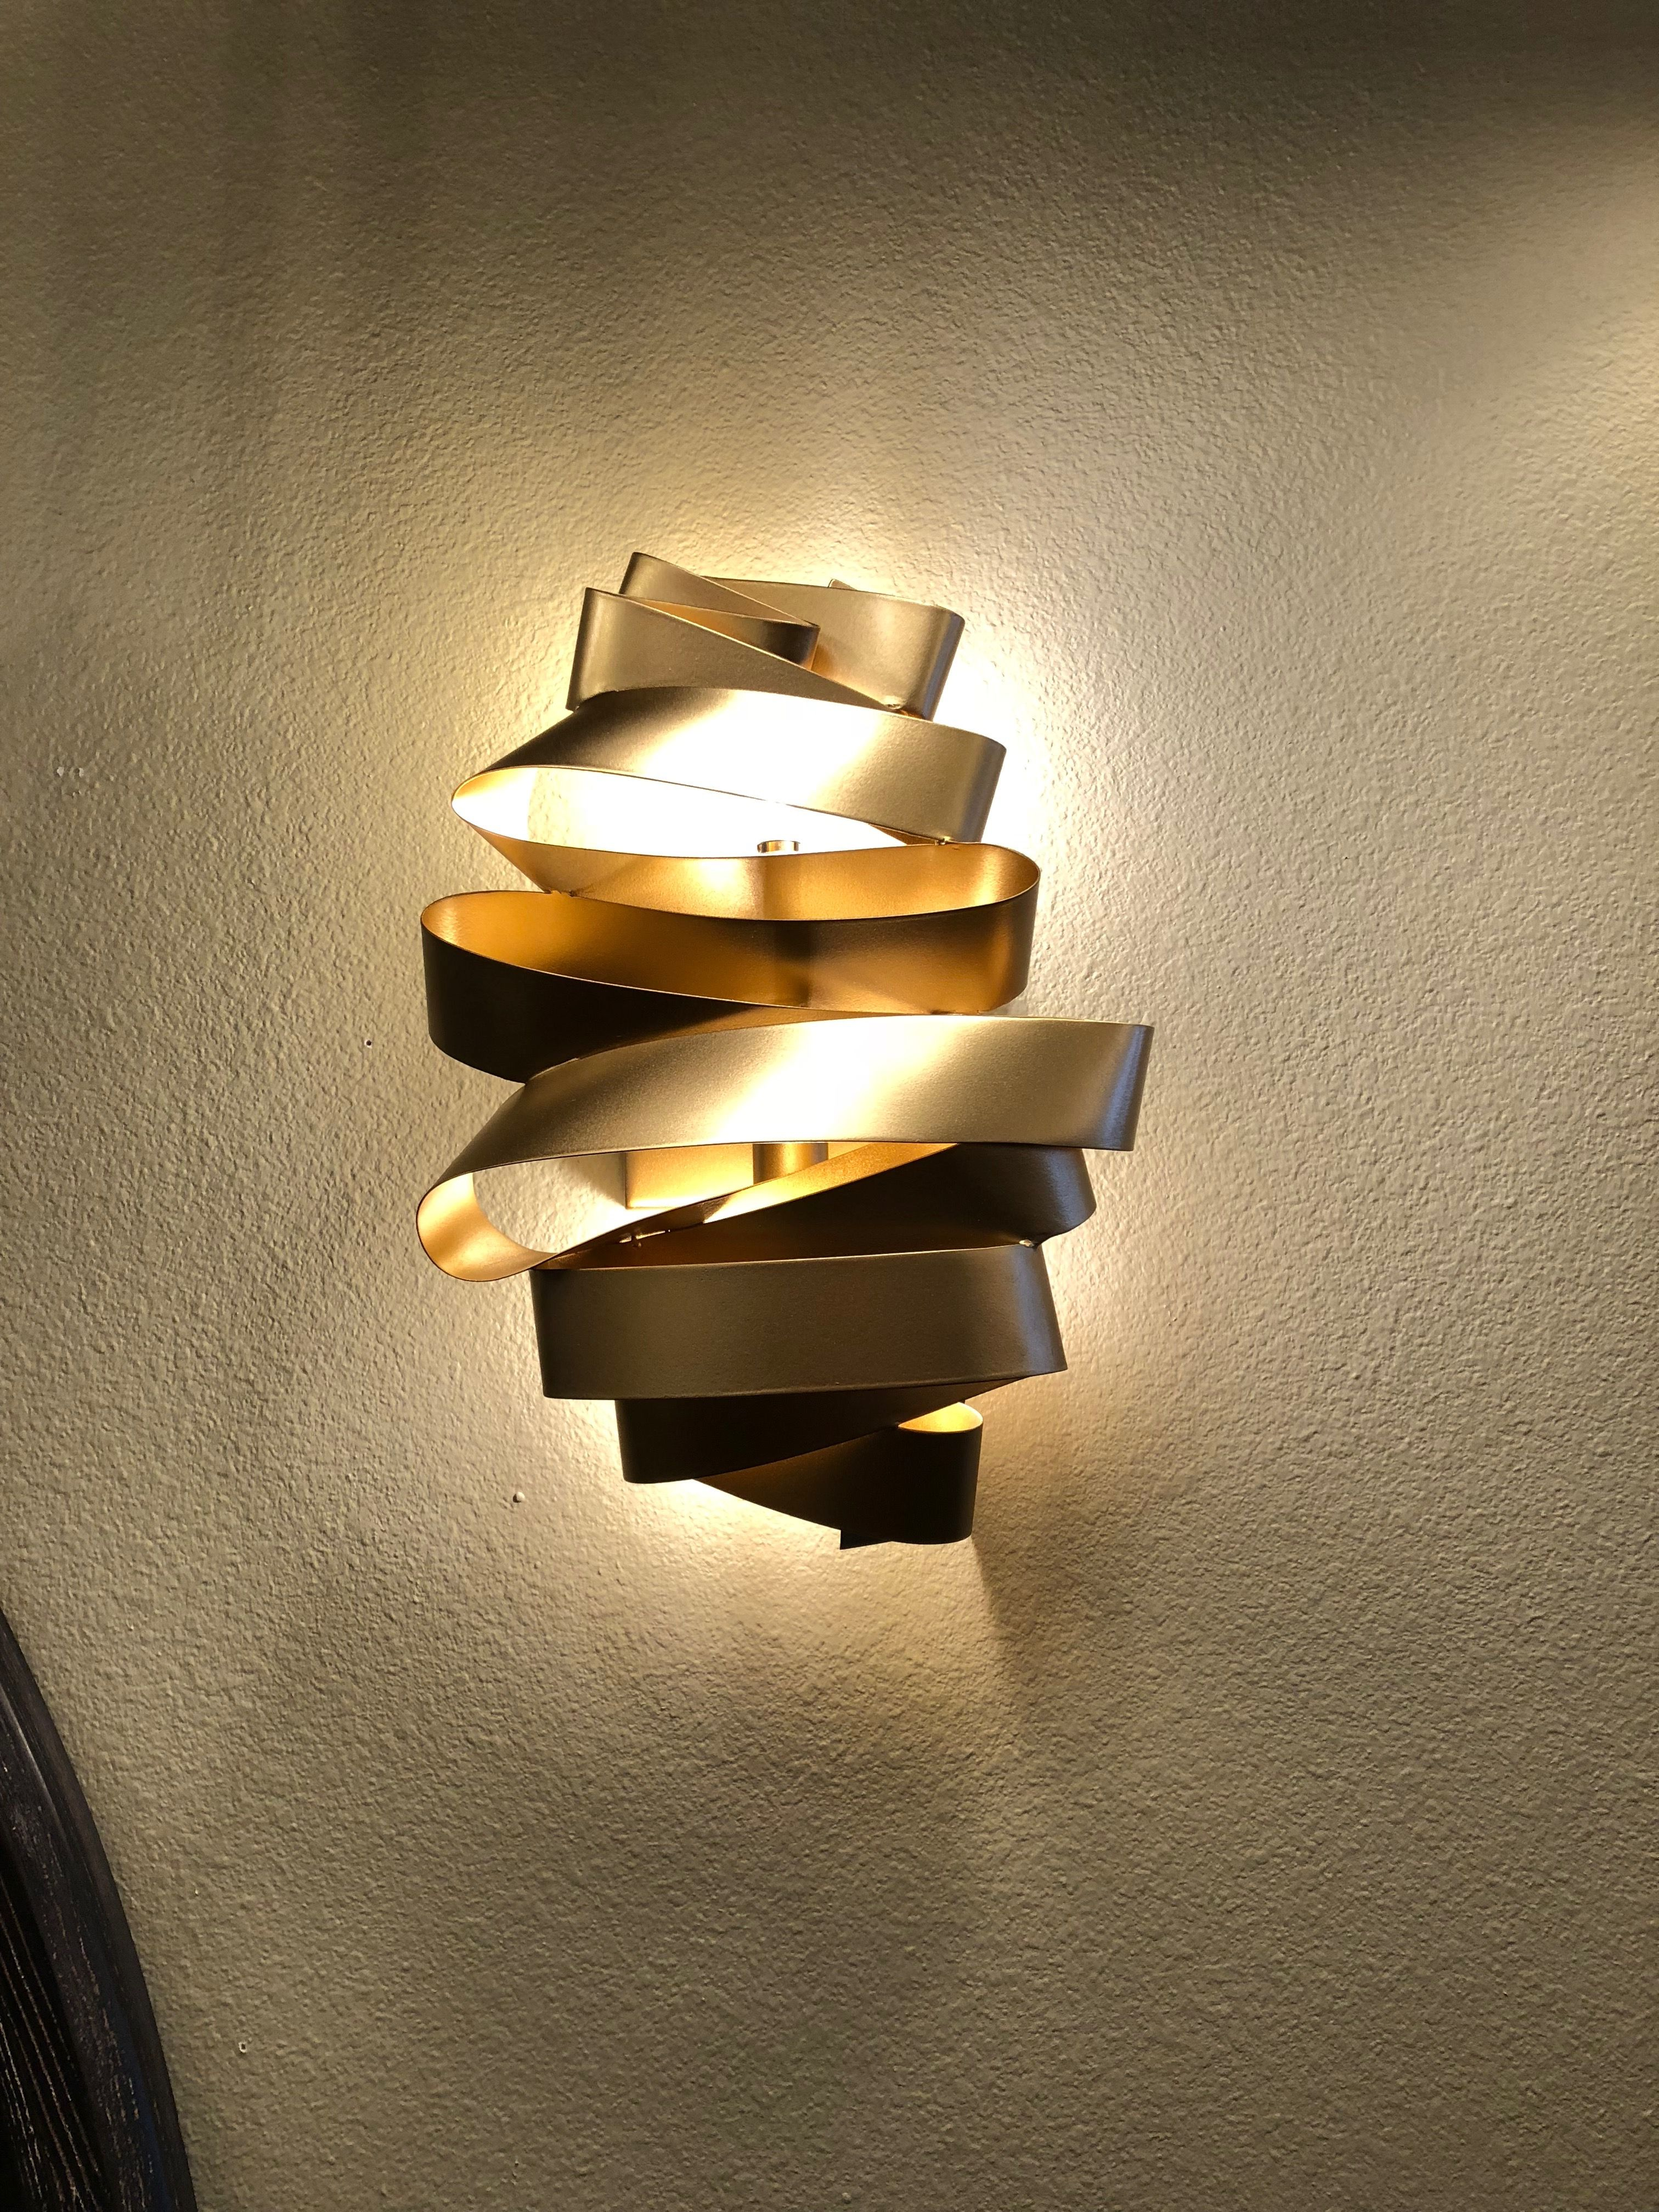 Bes Lighting 1 Funky House Ideas Home Decor